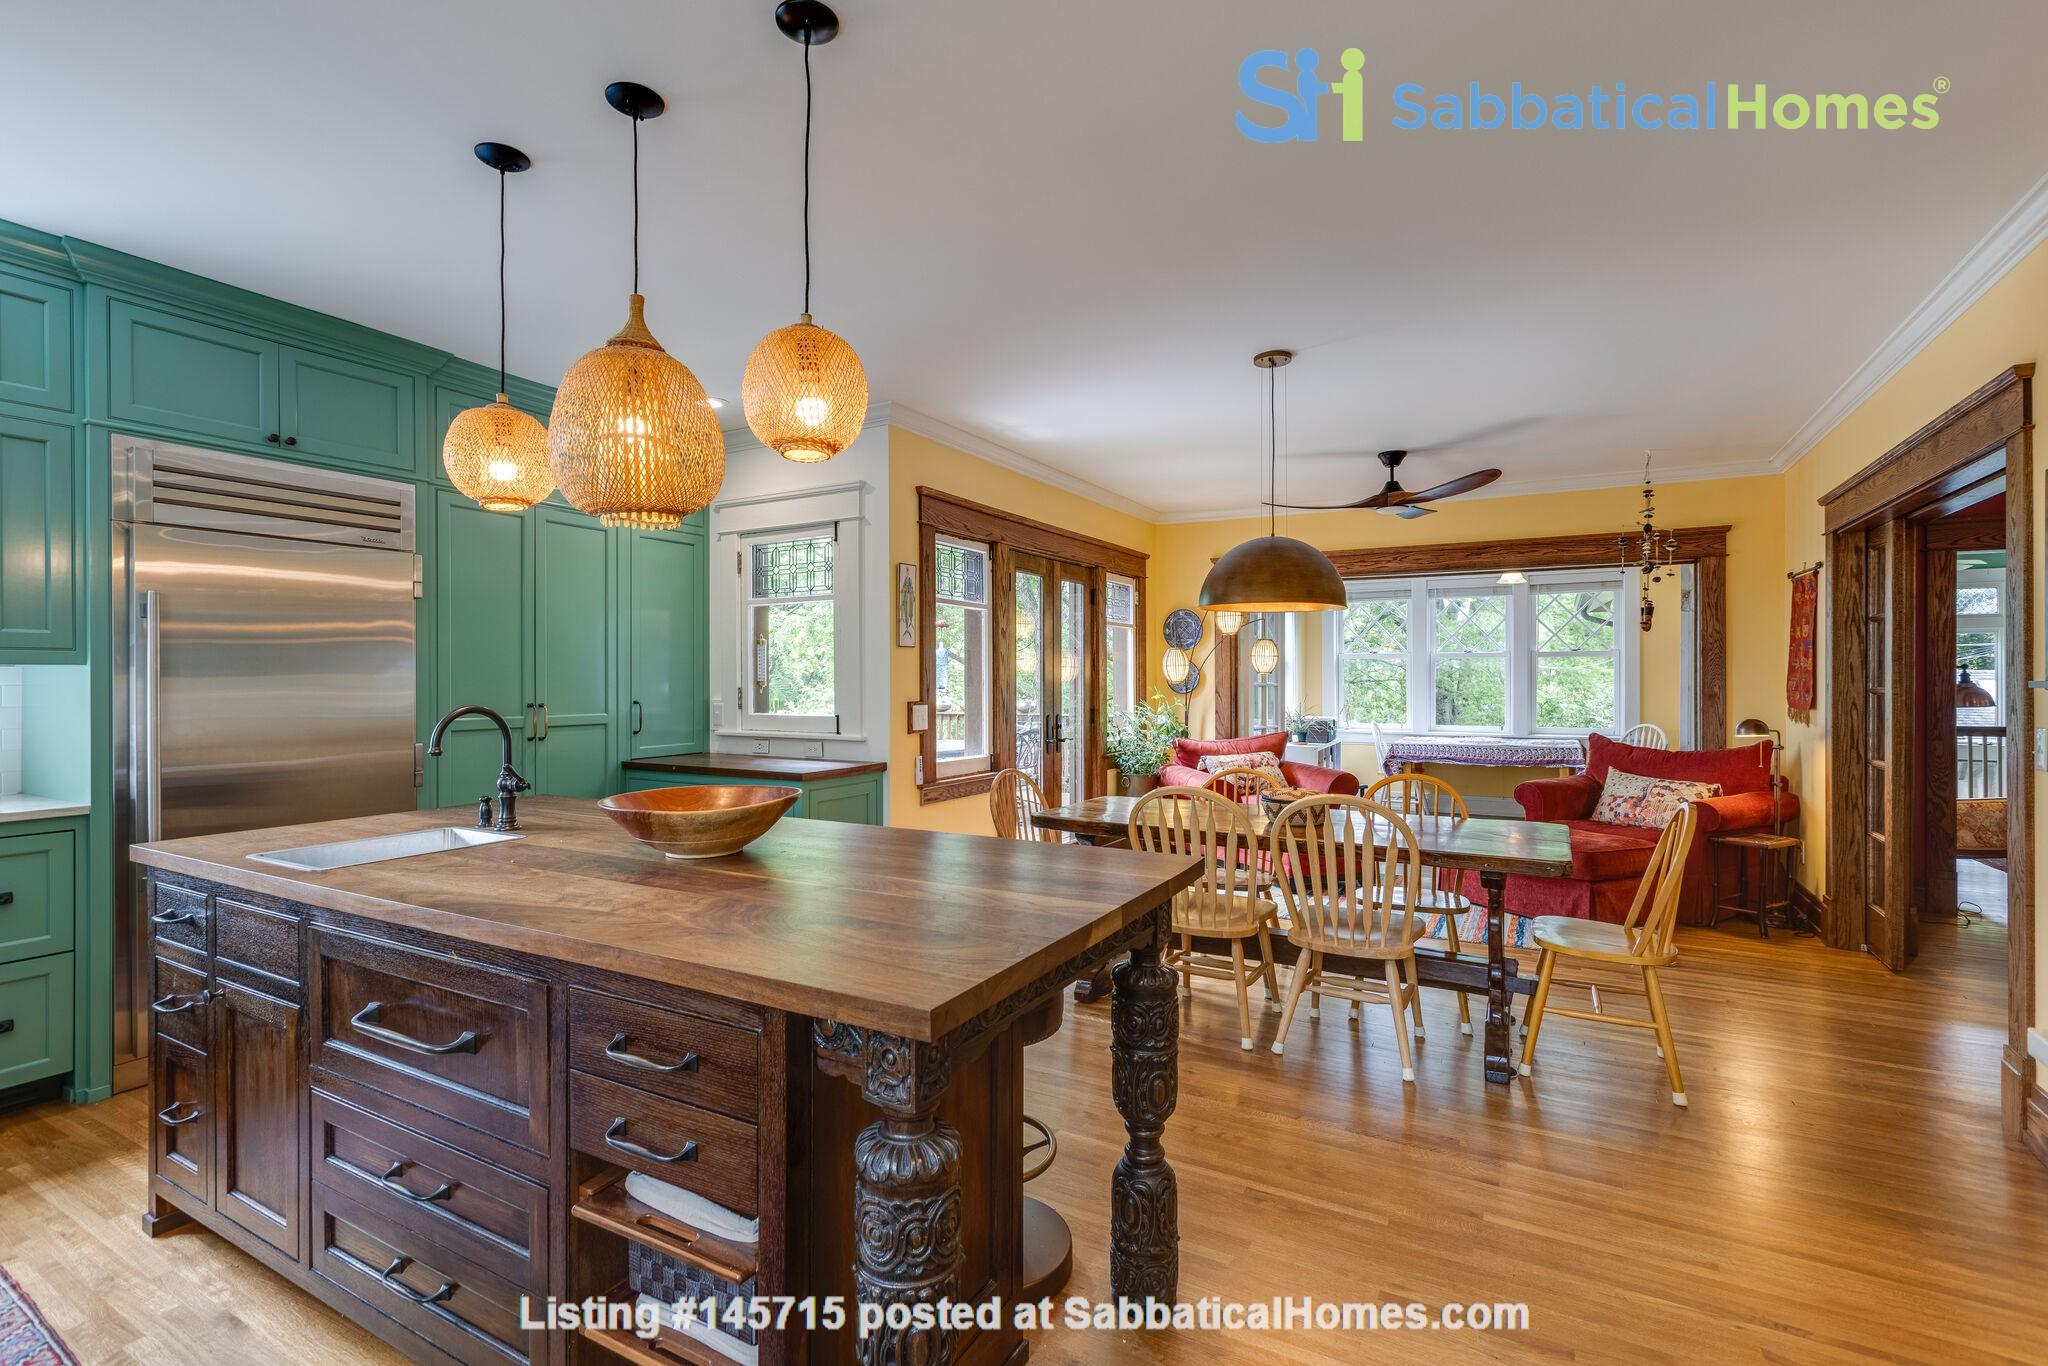 5 BR/3 + 2 BA Historic gem in Belmont-Hillsboro Home Rental in Nashville 4